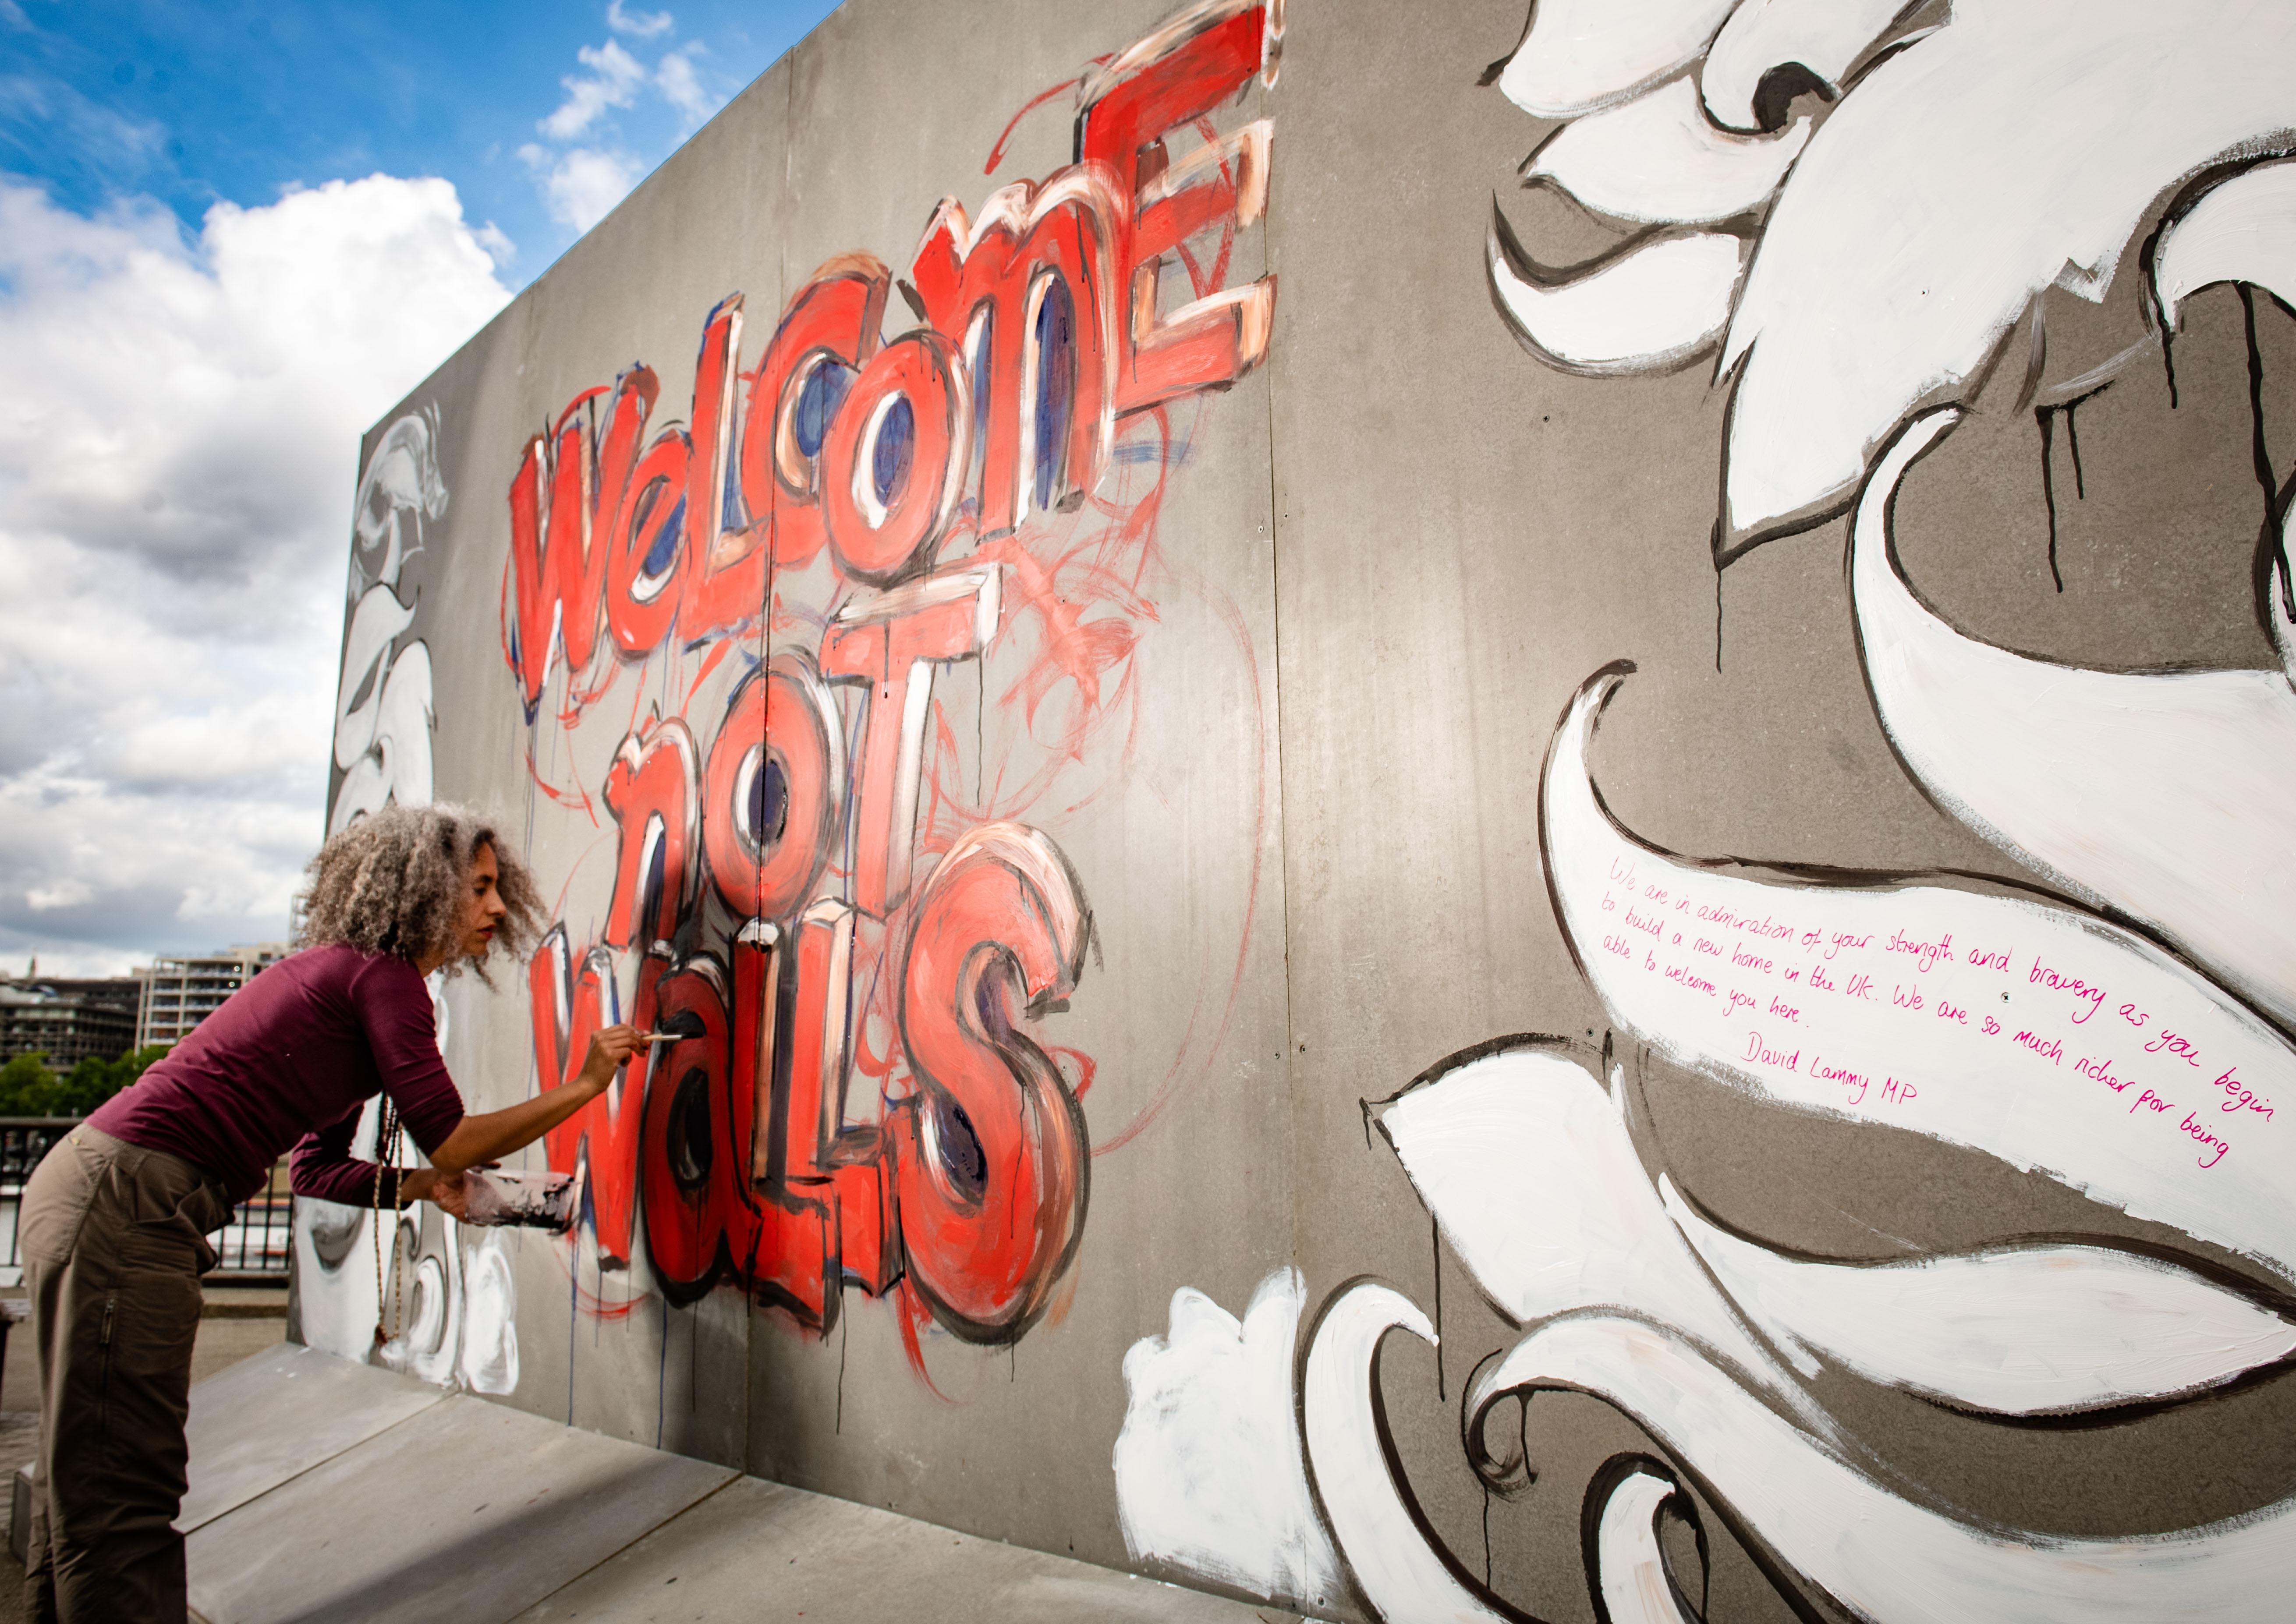 Ben & Jerry's Welcome Not Walls Manchester